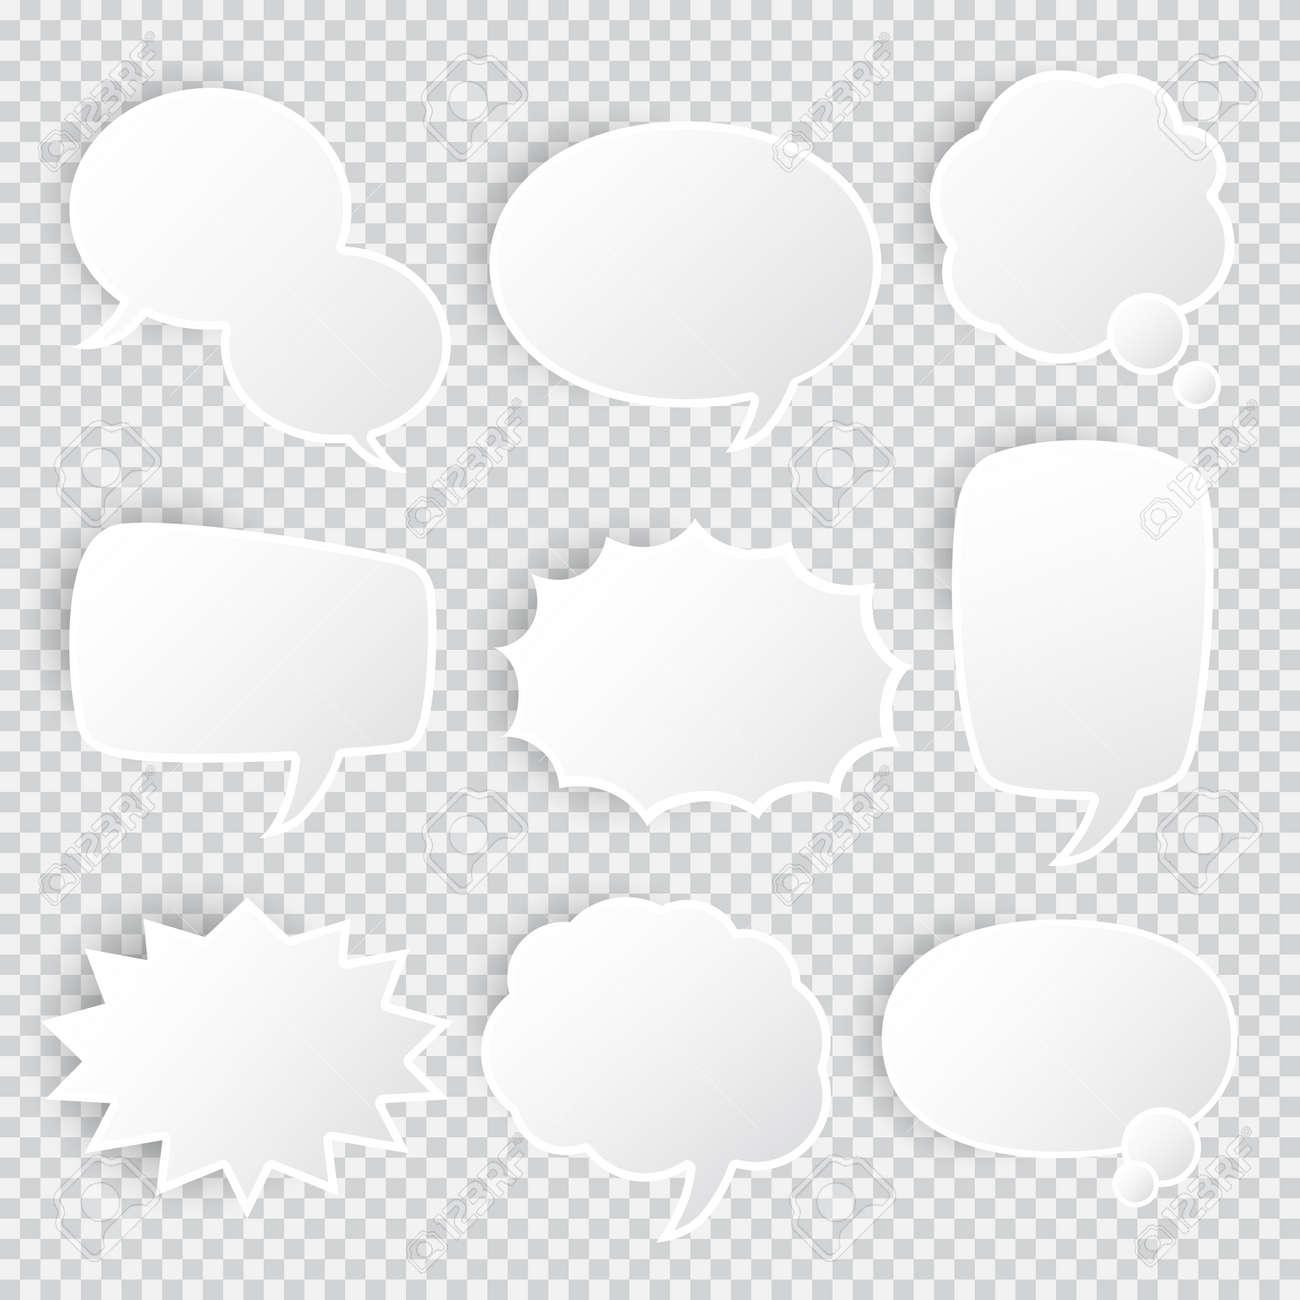 Set of empty realistic comic bubbles - 168591357